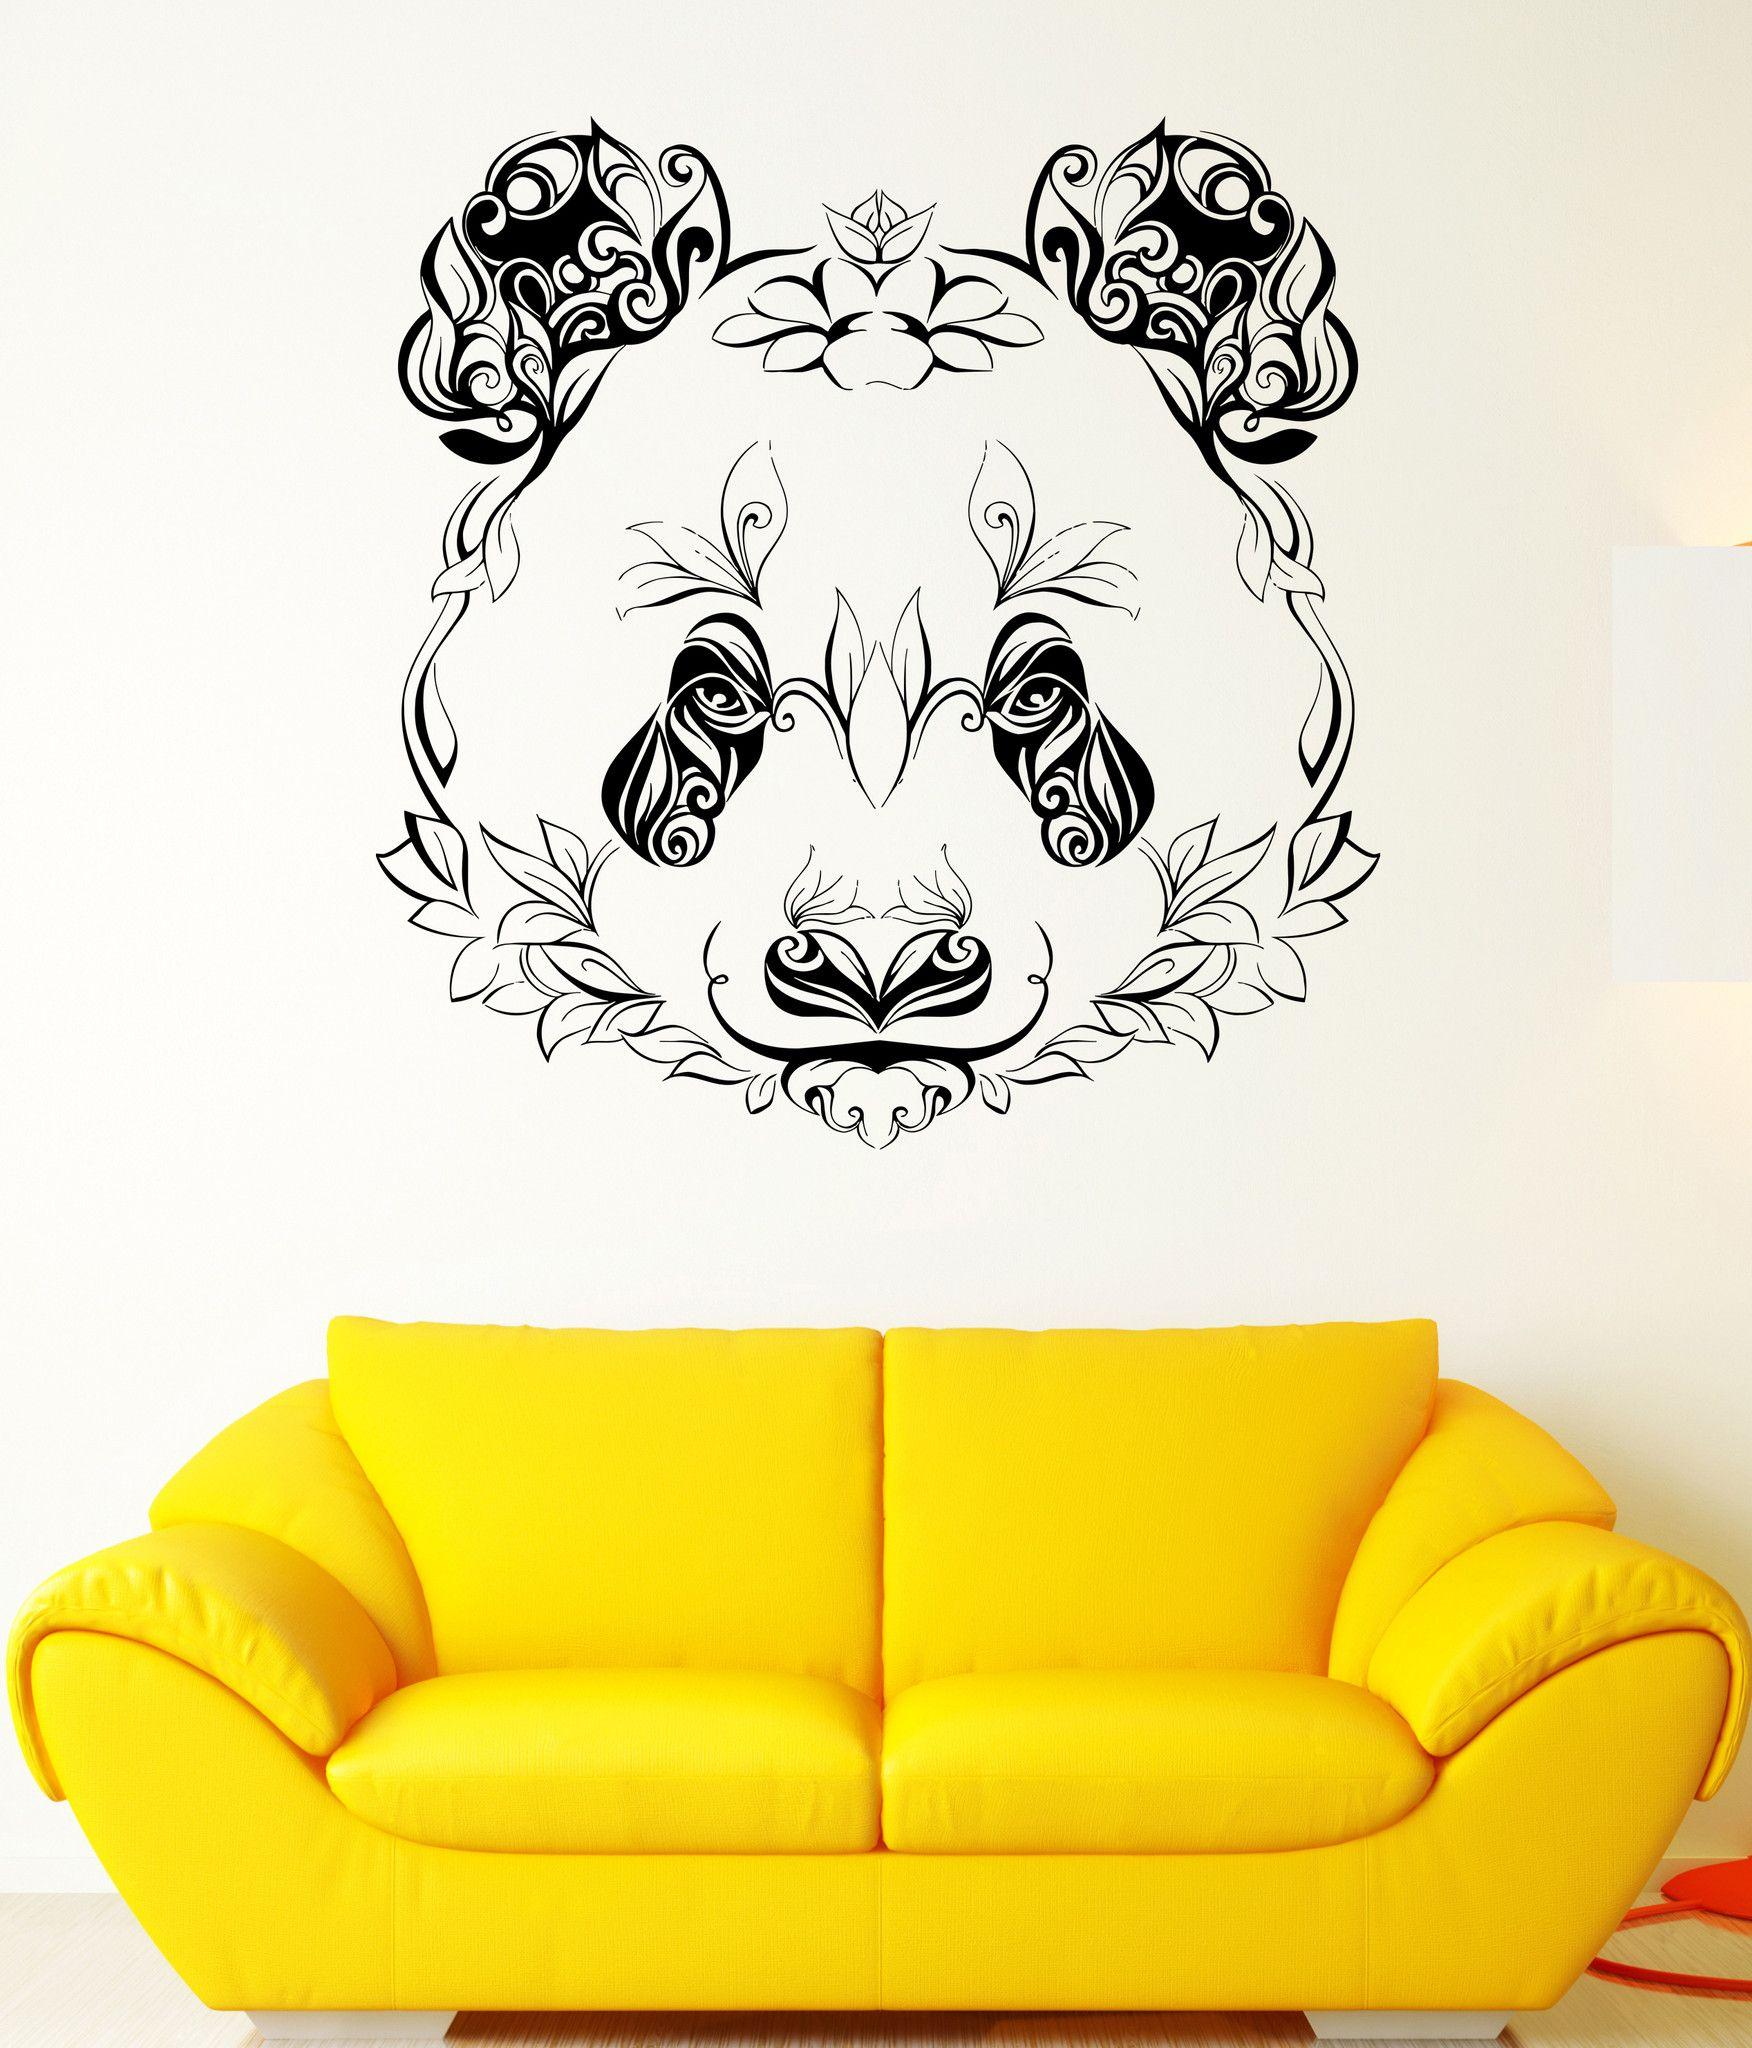 Wall Vinyl Sticker Decal Panda Animal Head Color Pattern Petals - Wall vinyl stickers